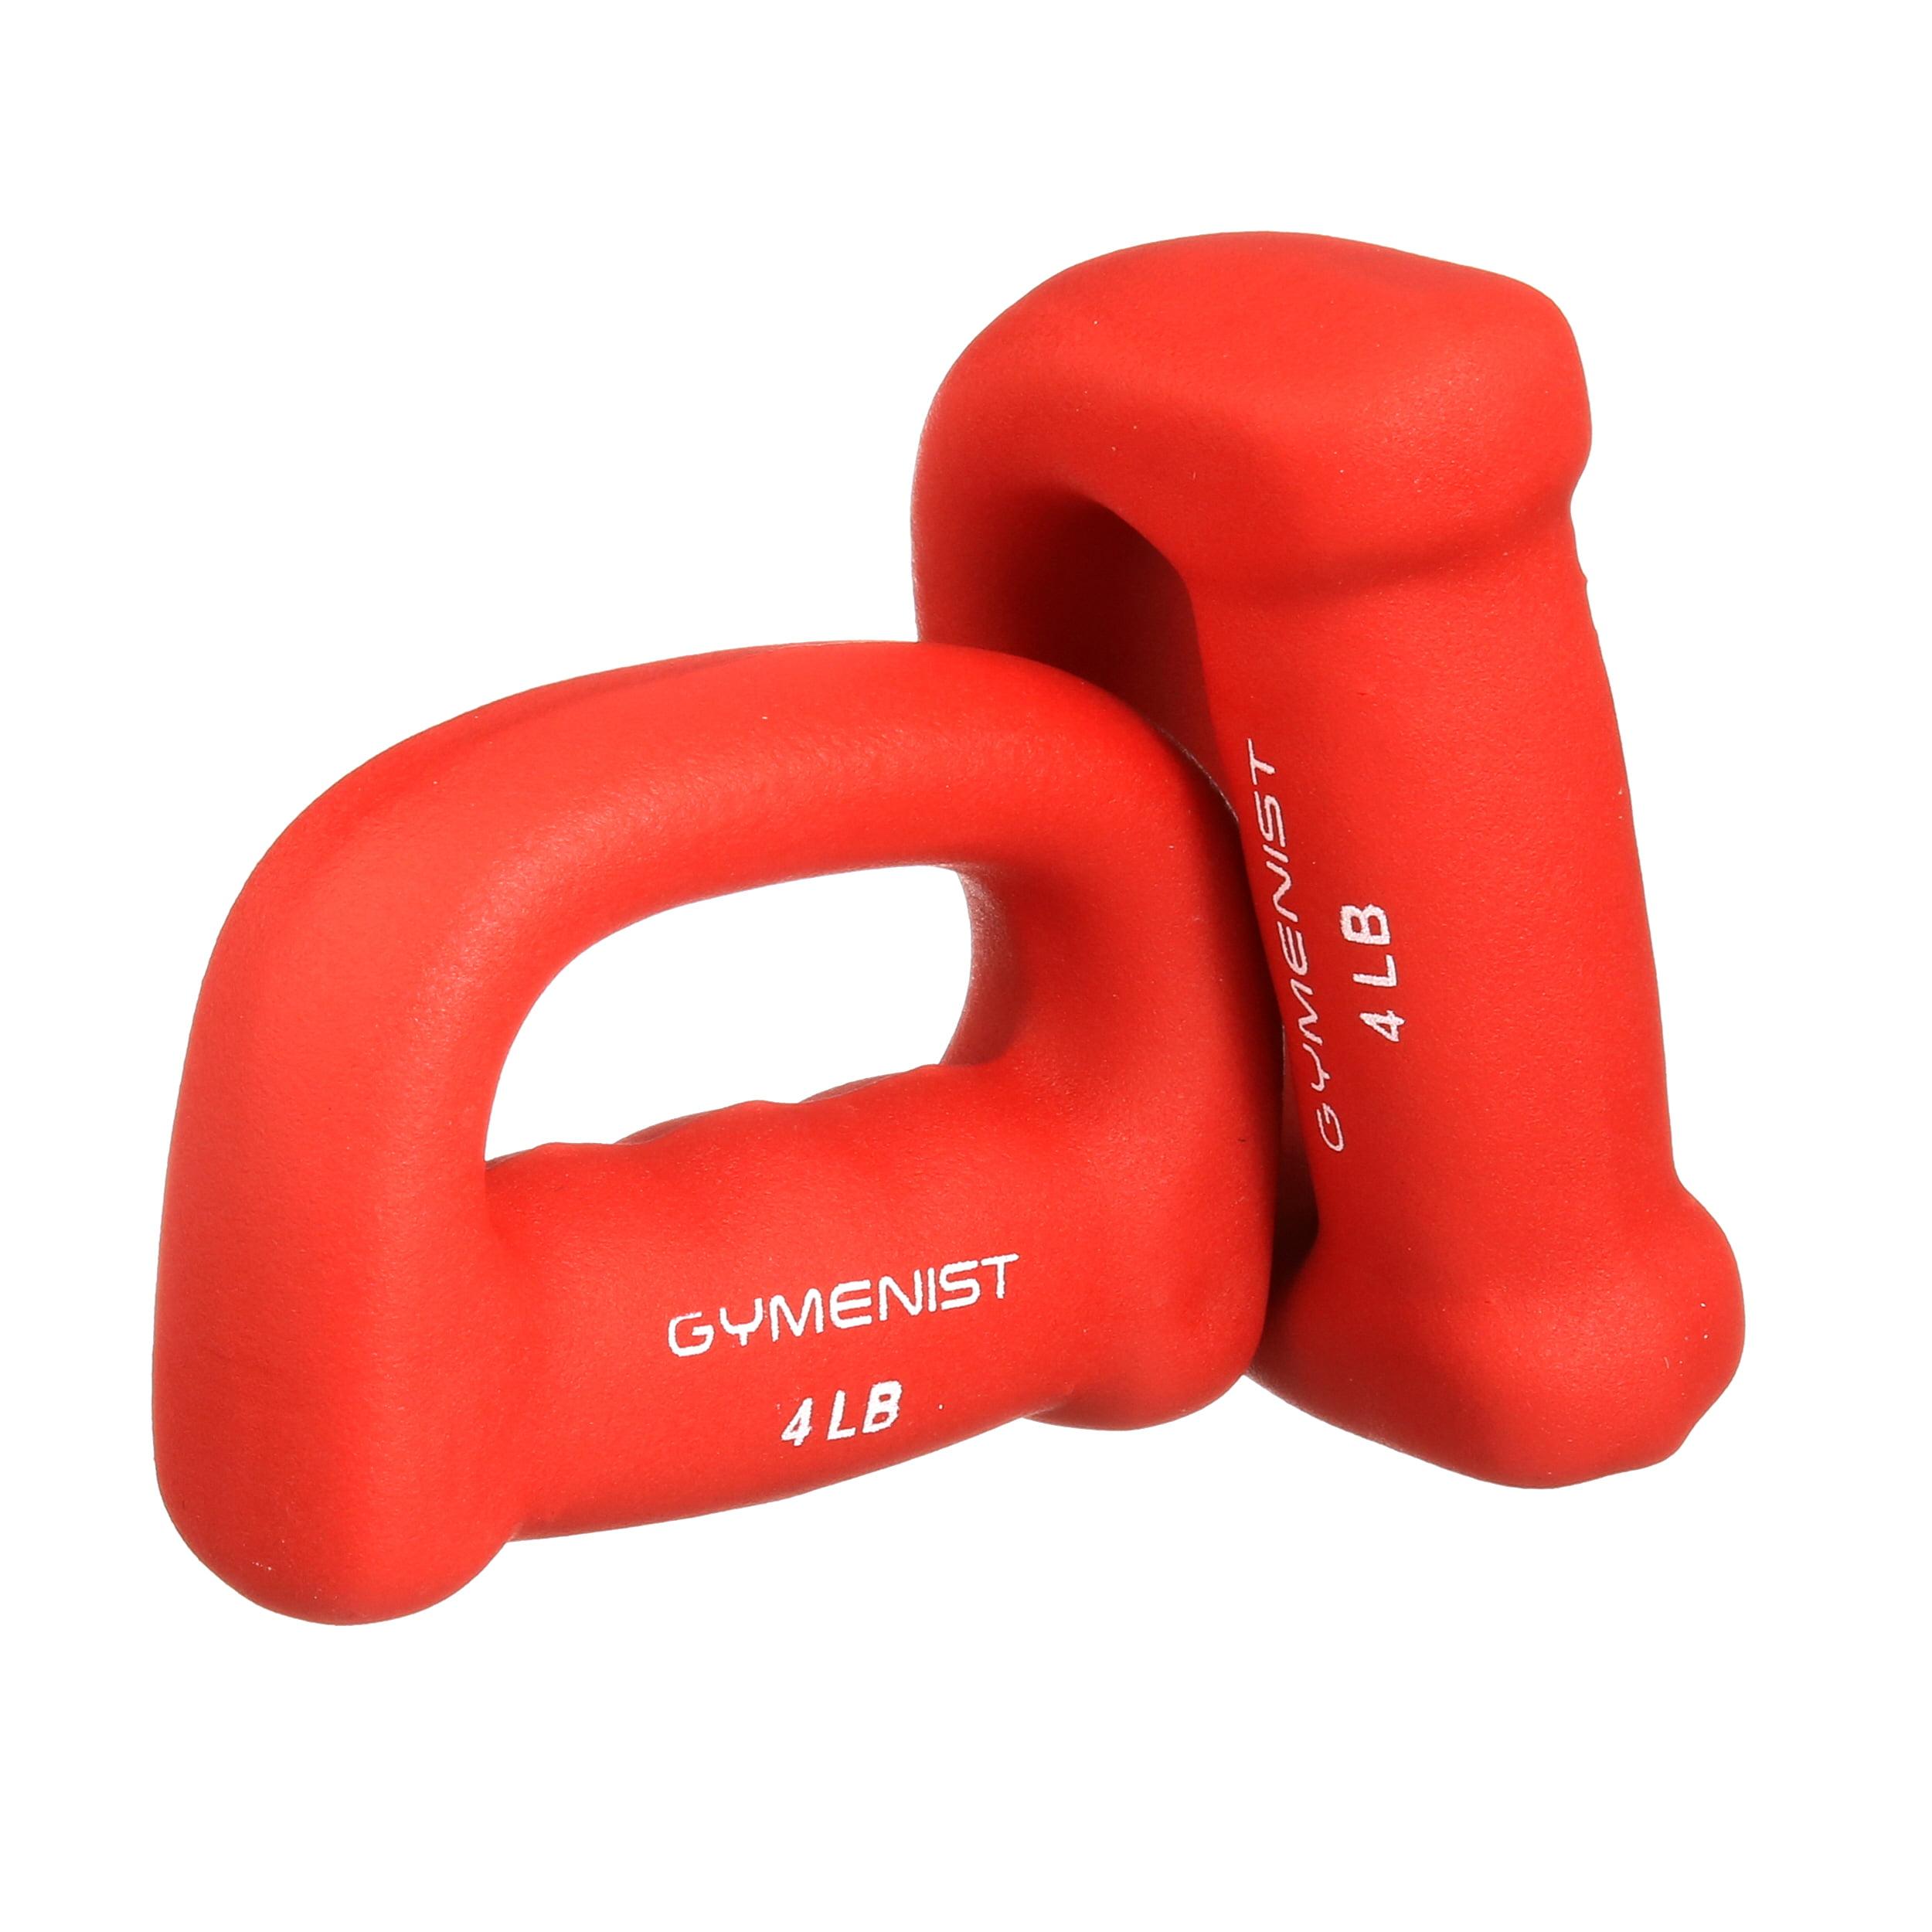 GYMENIST Set of 2 Hand Shaped Neoprene Exercise Workout Jogging Walking Cardio Dumbbells Pair